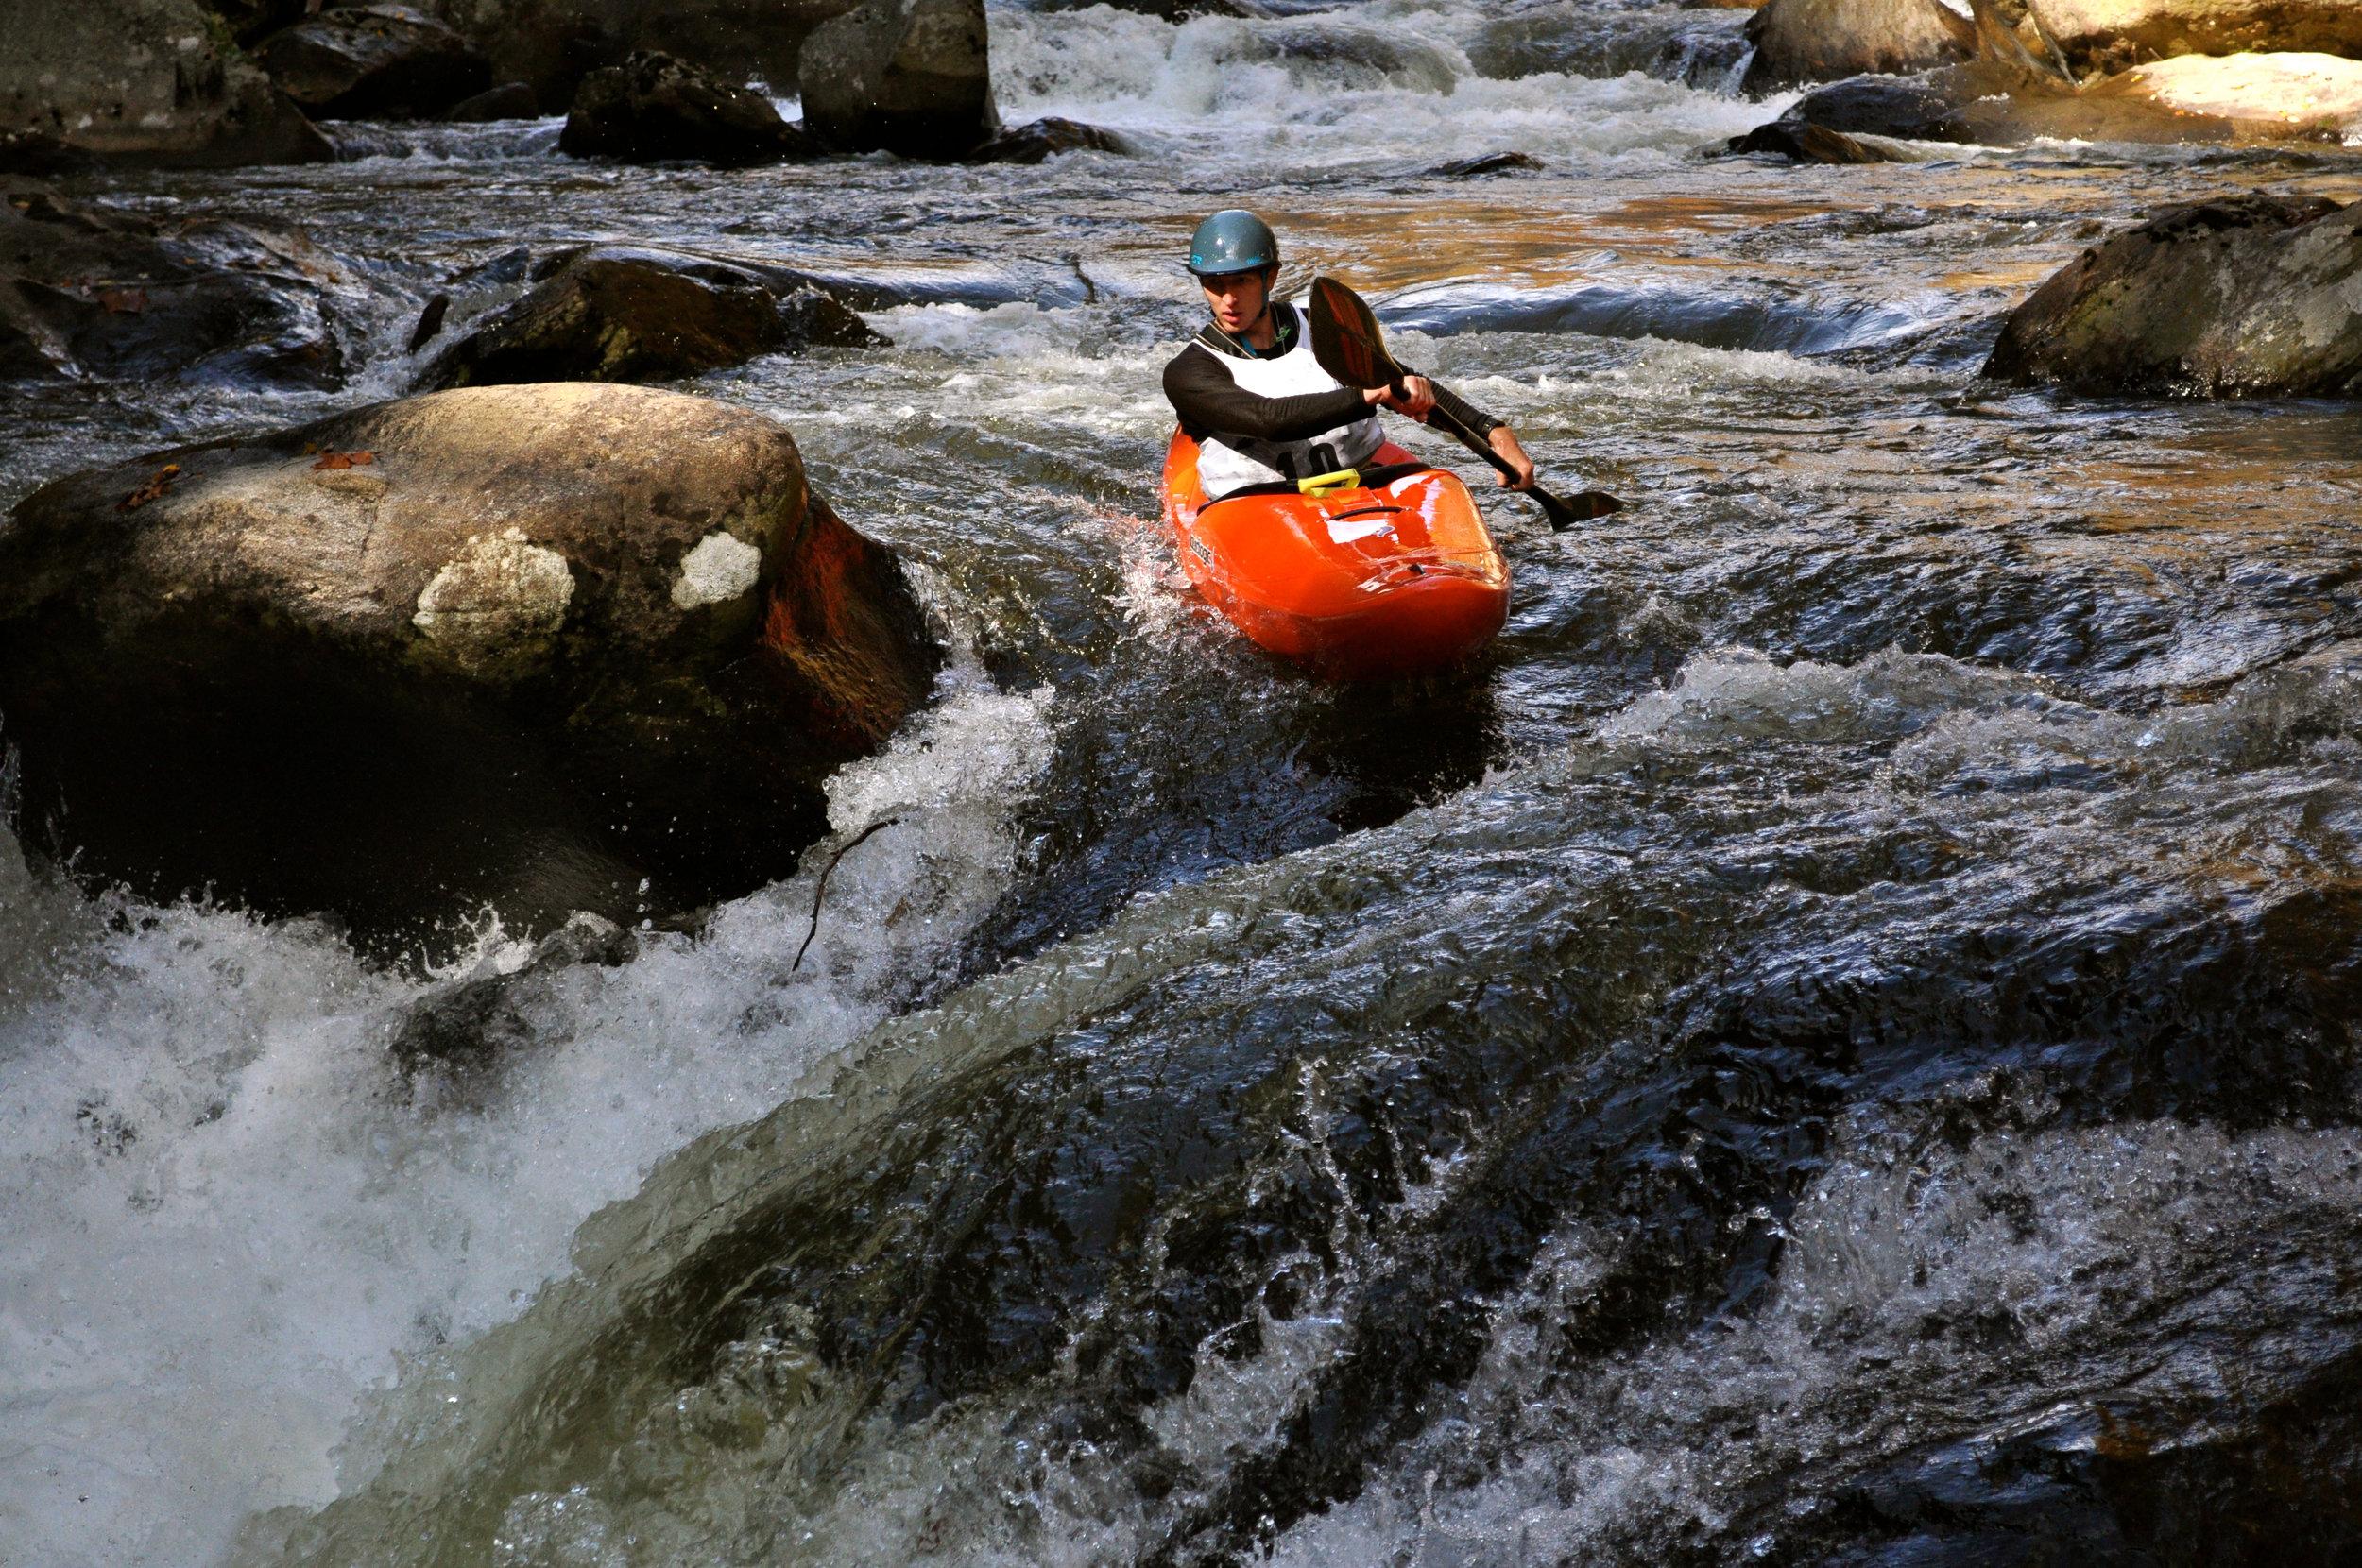 Green River Race NC